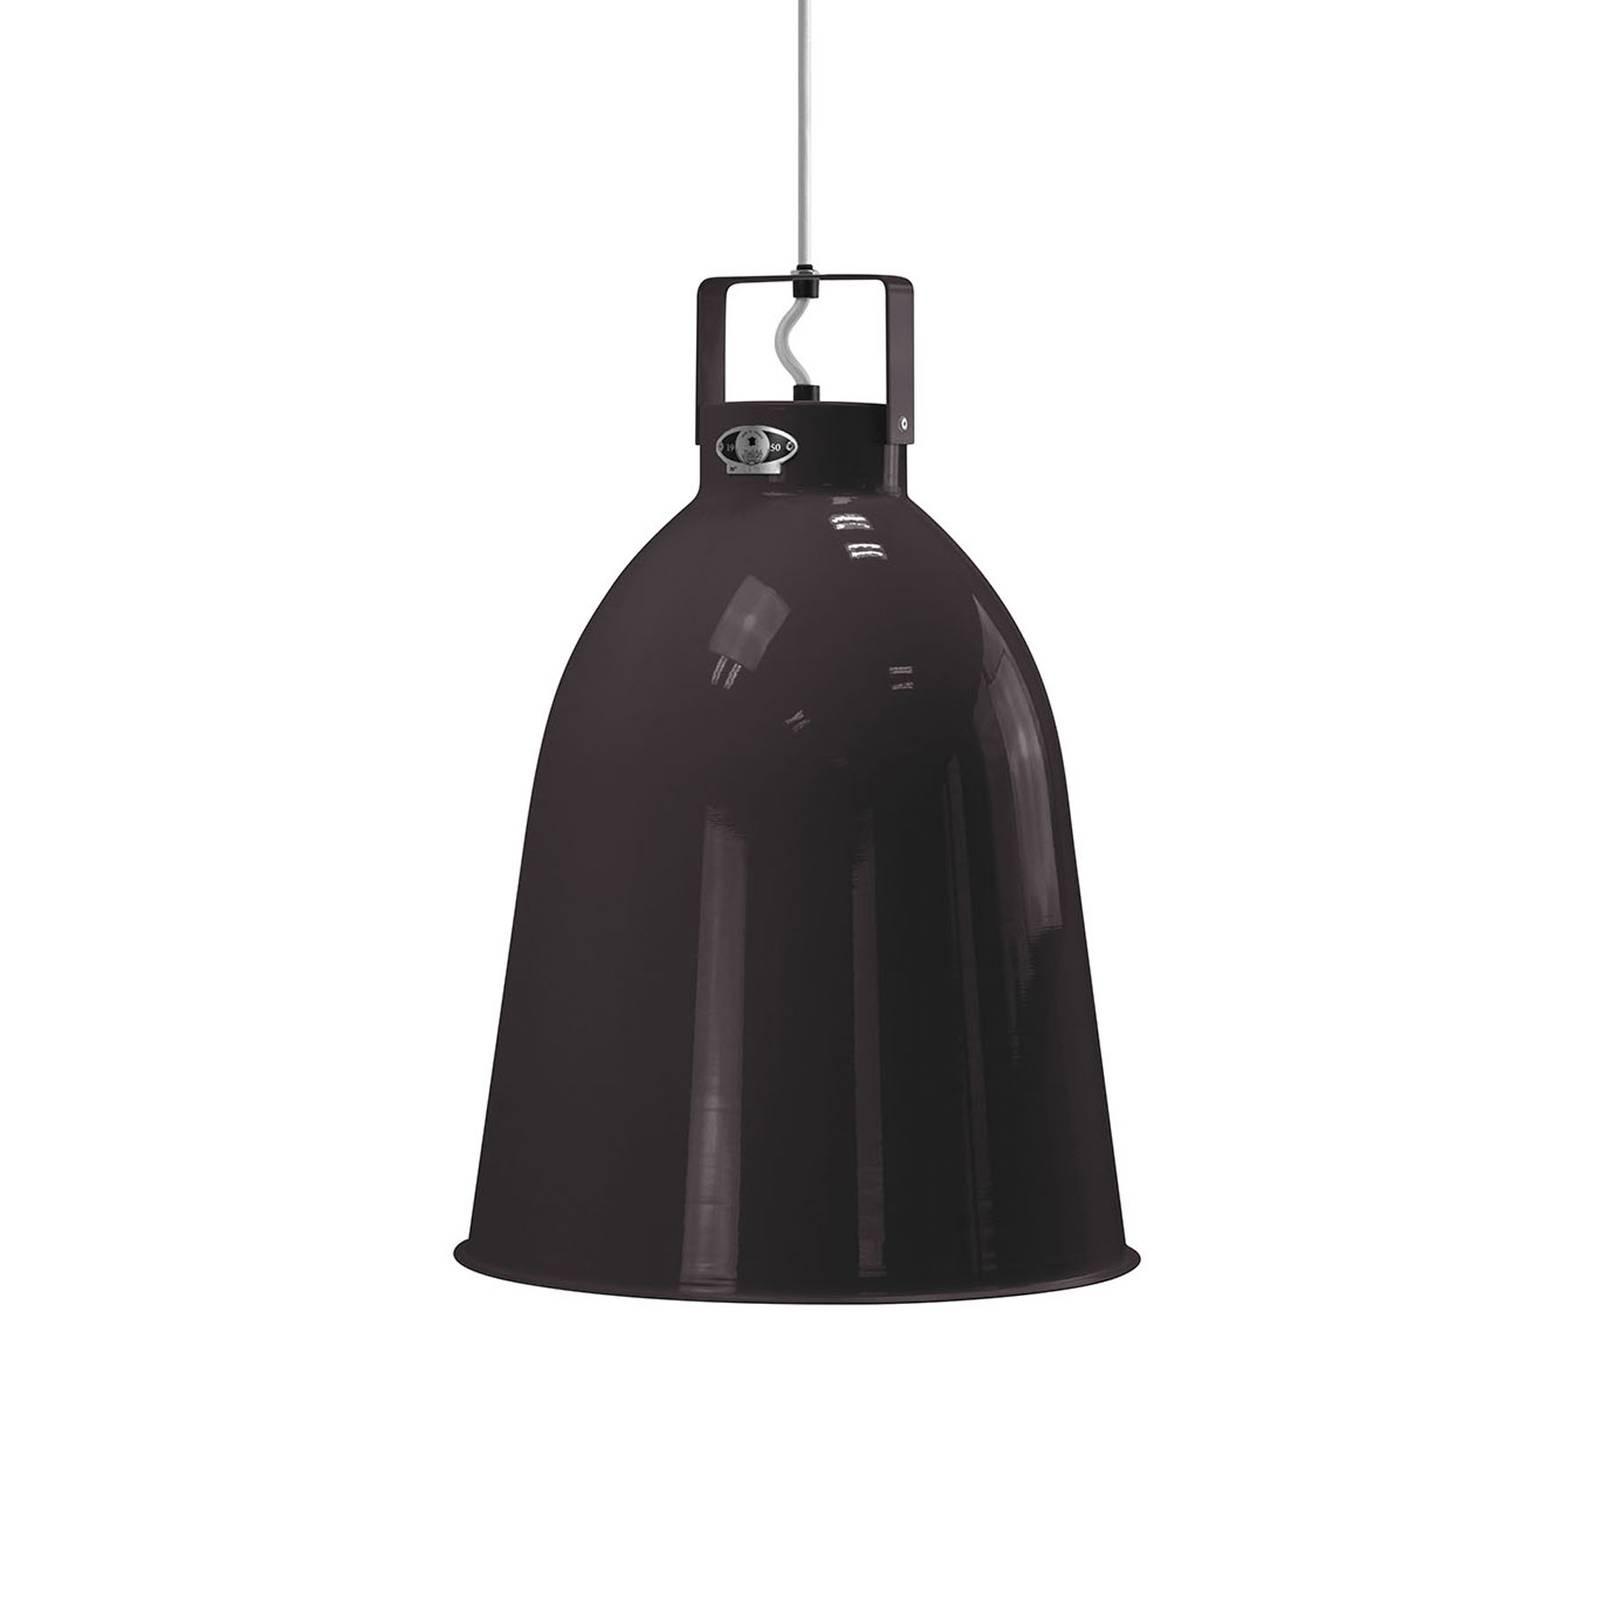 Jieldé Clément C360 hanglamp zwart glans Ø36cm